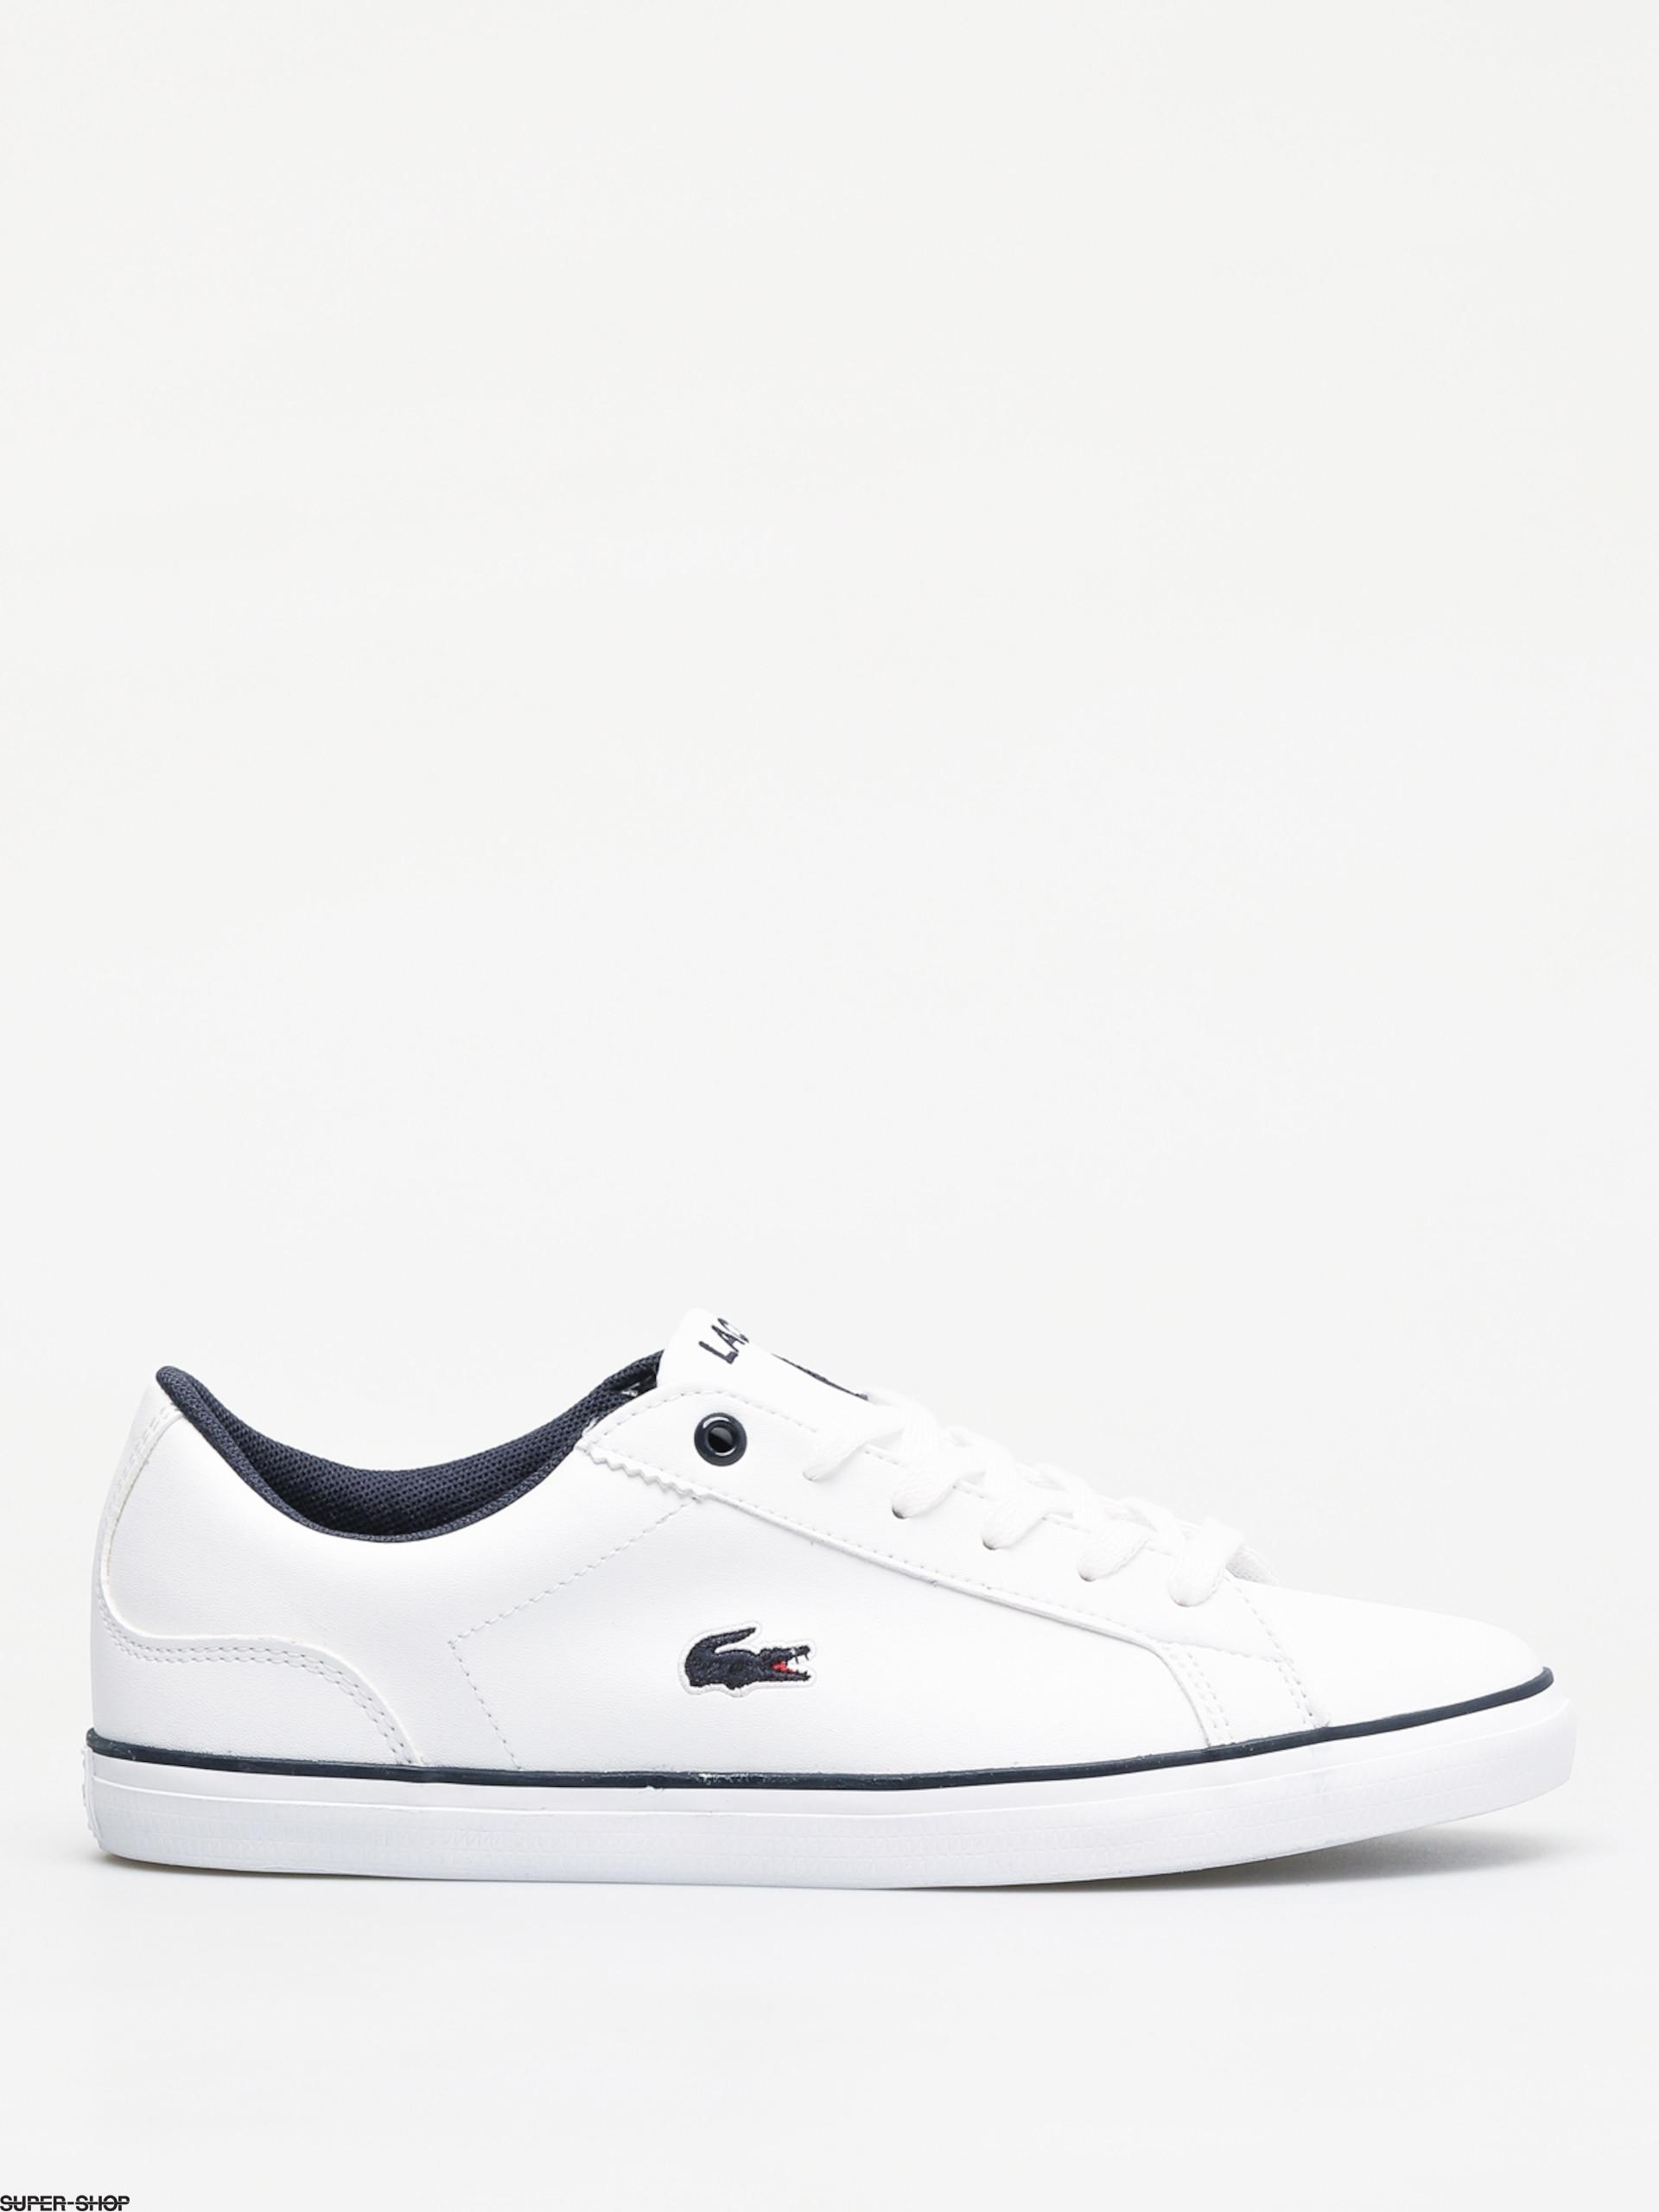 96064c9db 1027360-w1920-lacoste-lerond-bl-2-shoes-wmn-navy-white.jpg